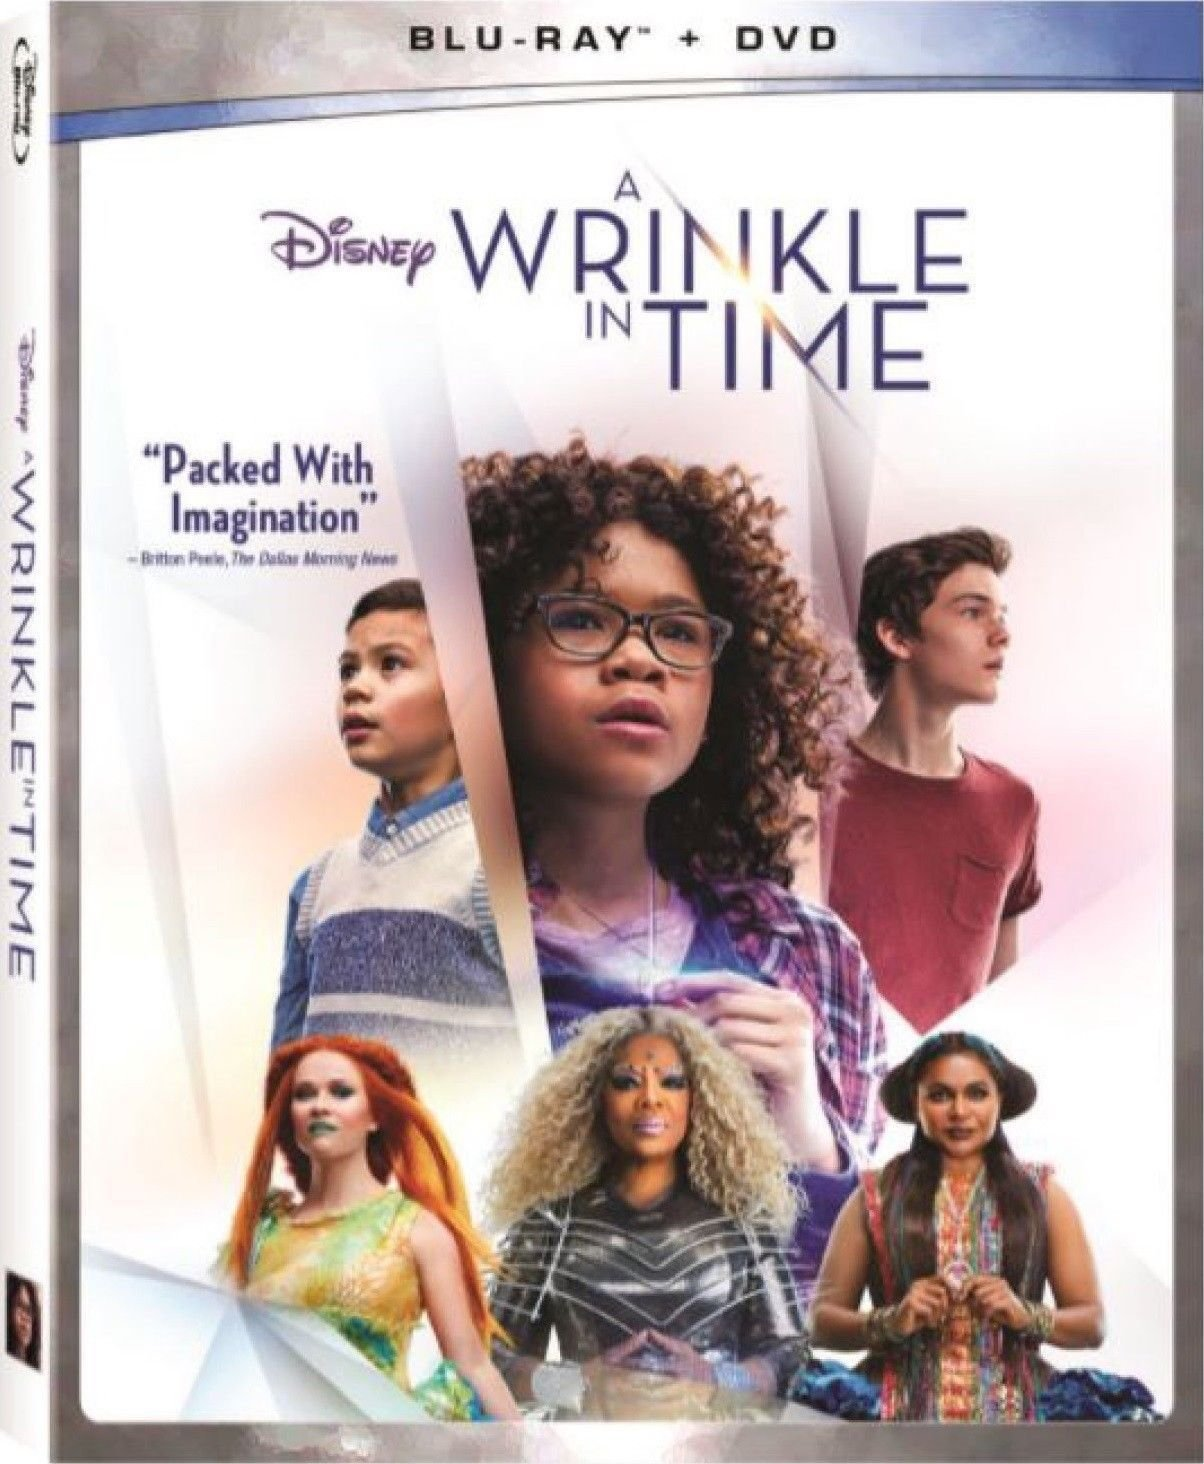 A Wrinkle In Time Blu-ray + DVD - No Digital Copy